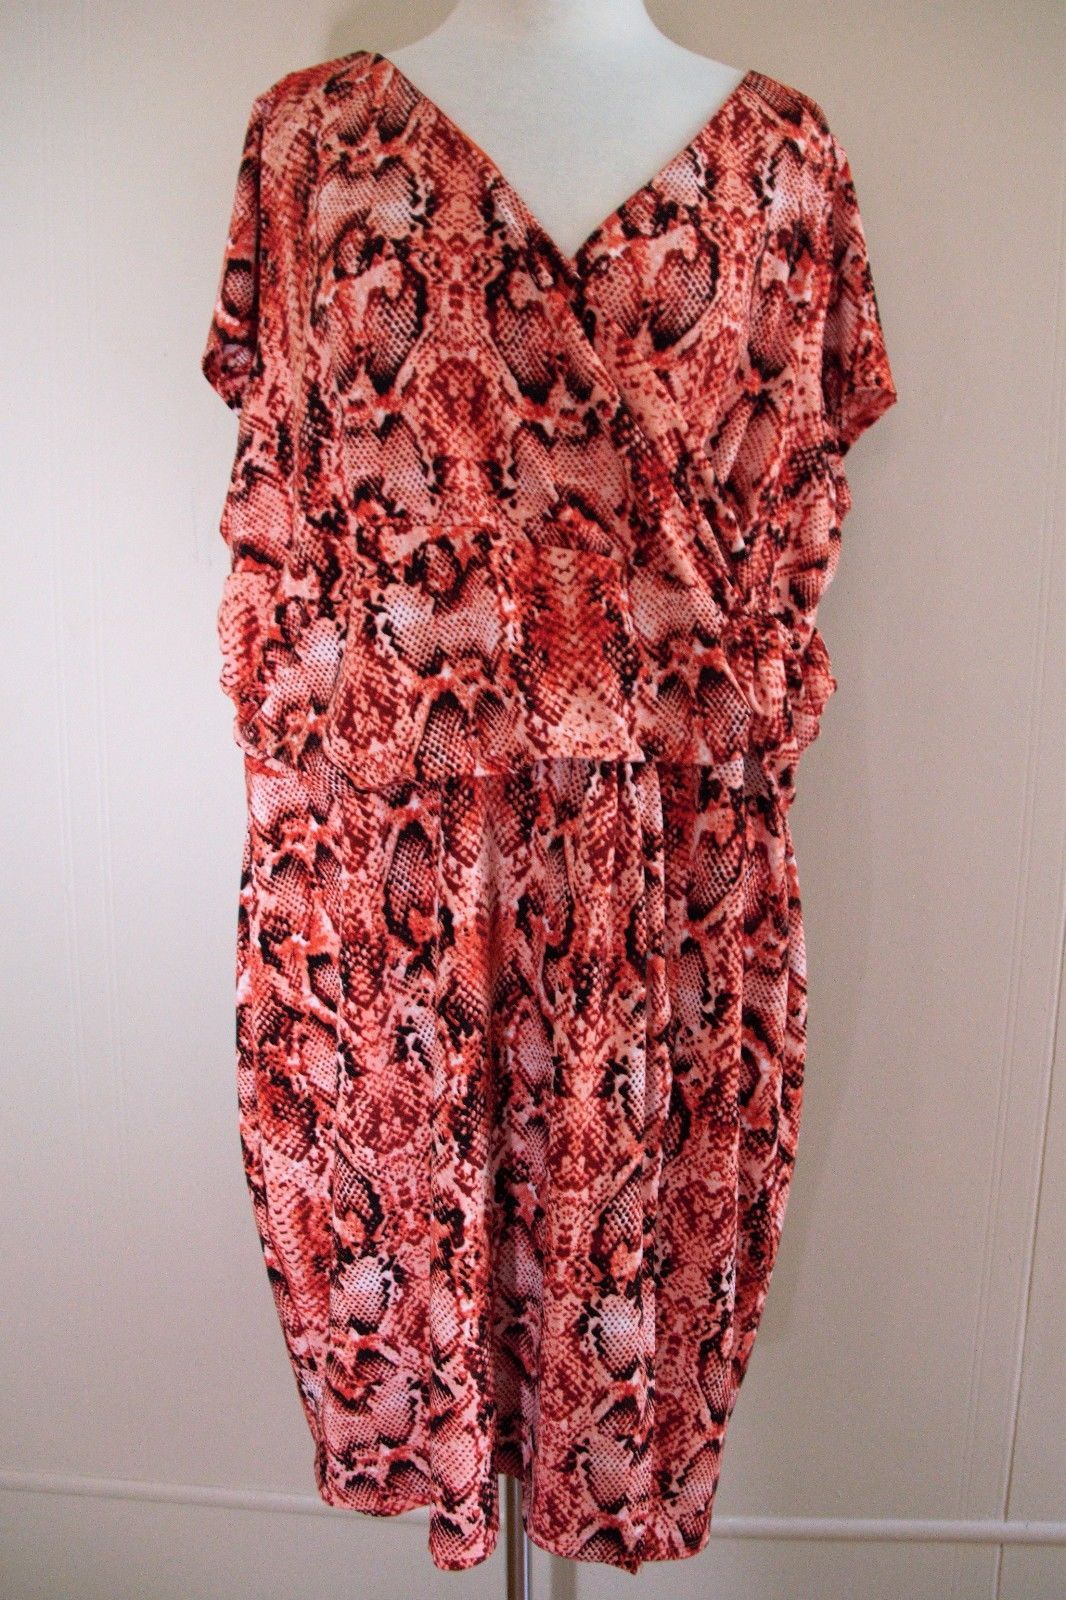 d9e1642b8c Carmen Marc Valvo Dress orange peach black and 24 similar items. 57